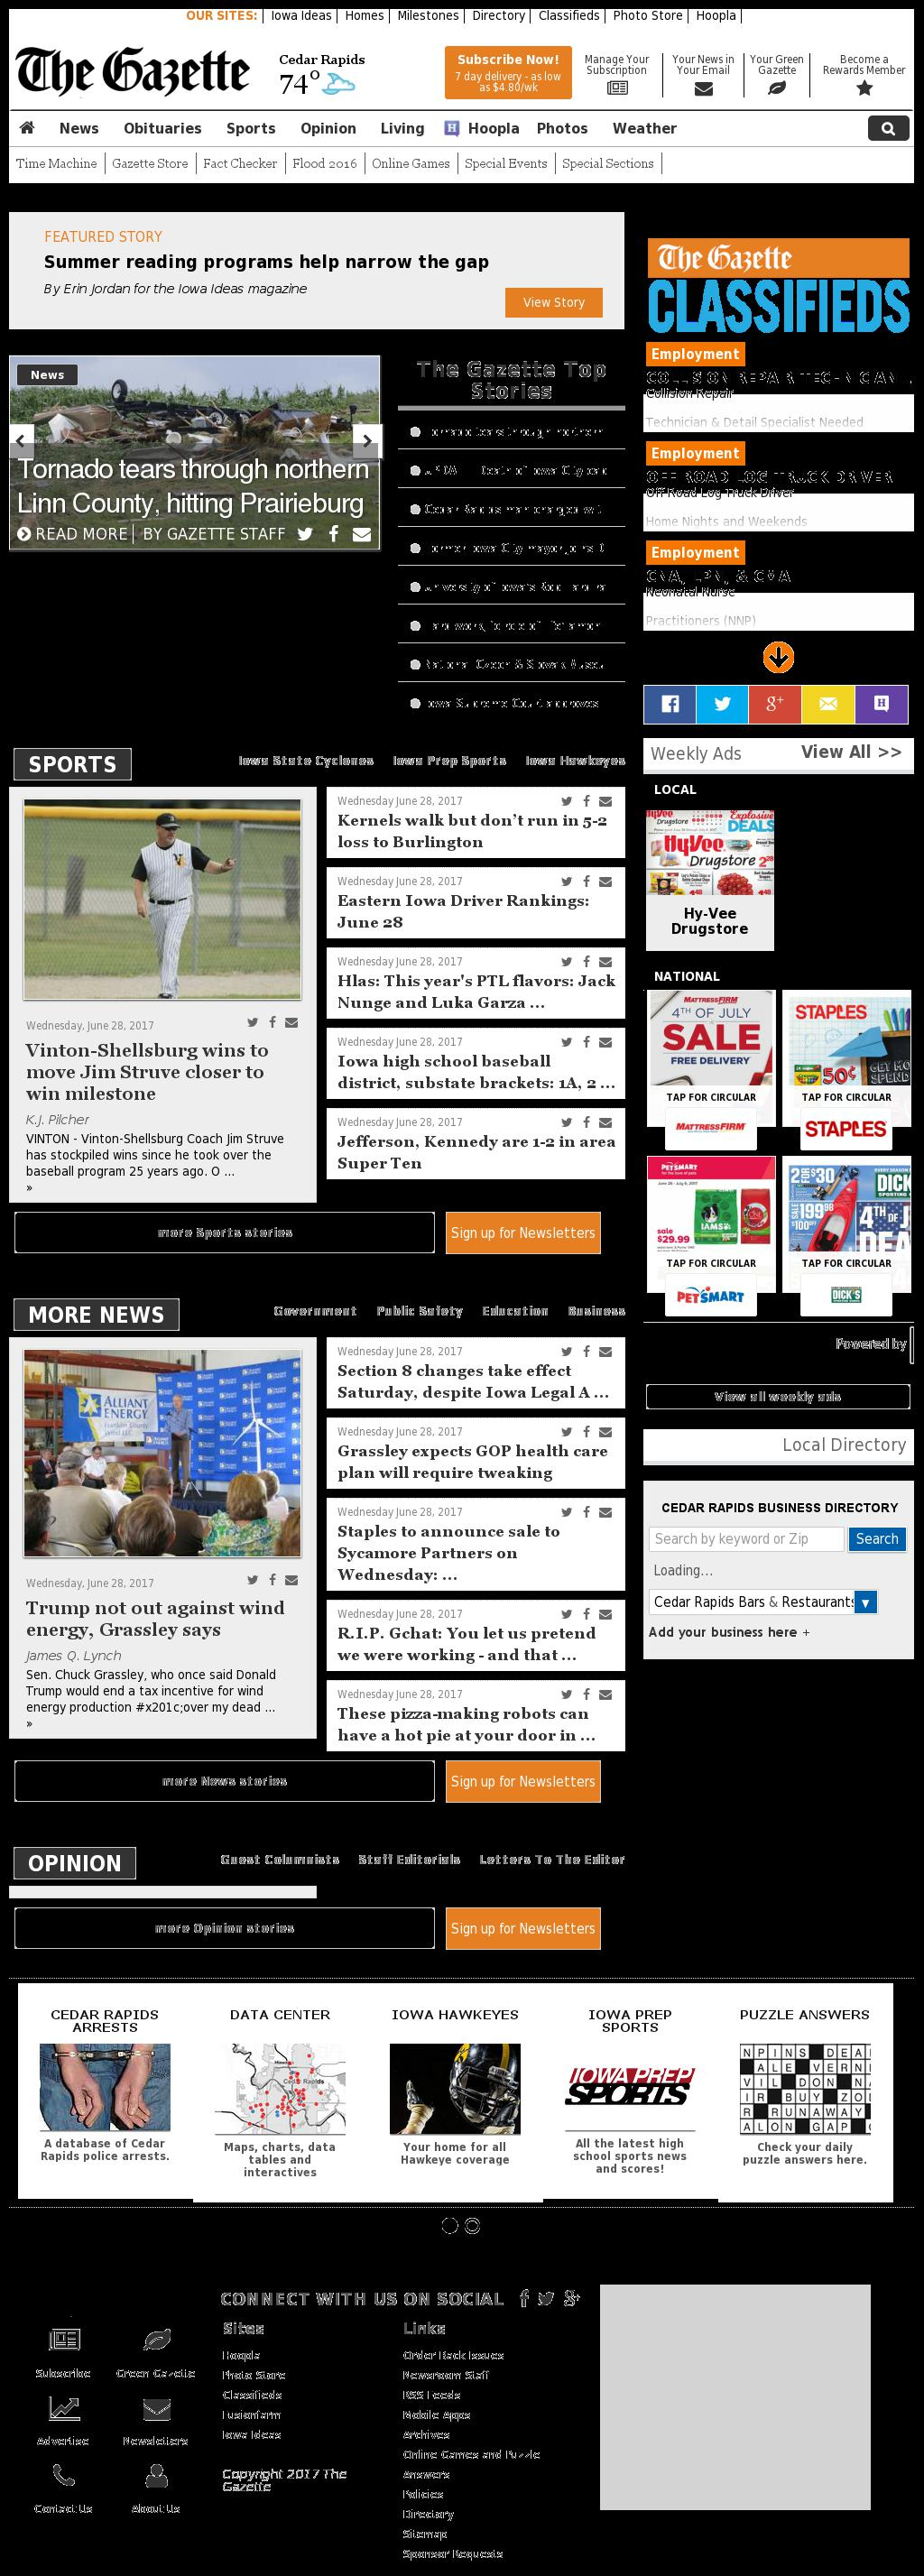 The (Cedar Rapids) Gazette at Thursday June 29, 2017, 6:06 a.m. UTC